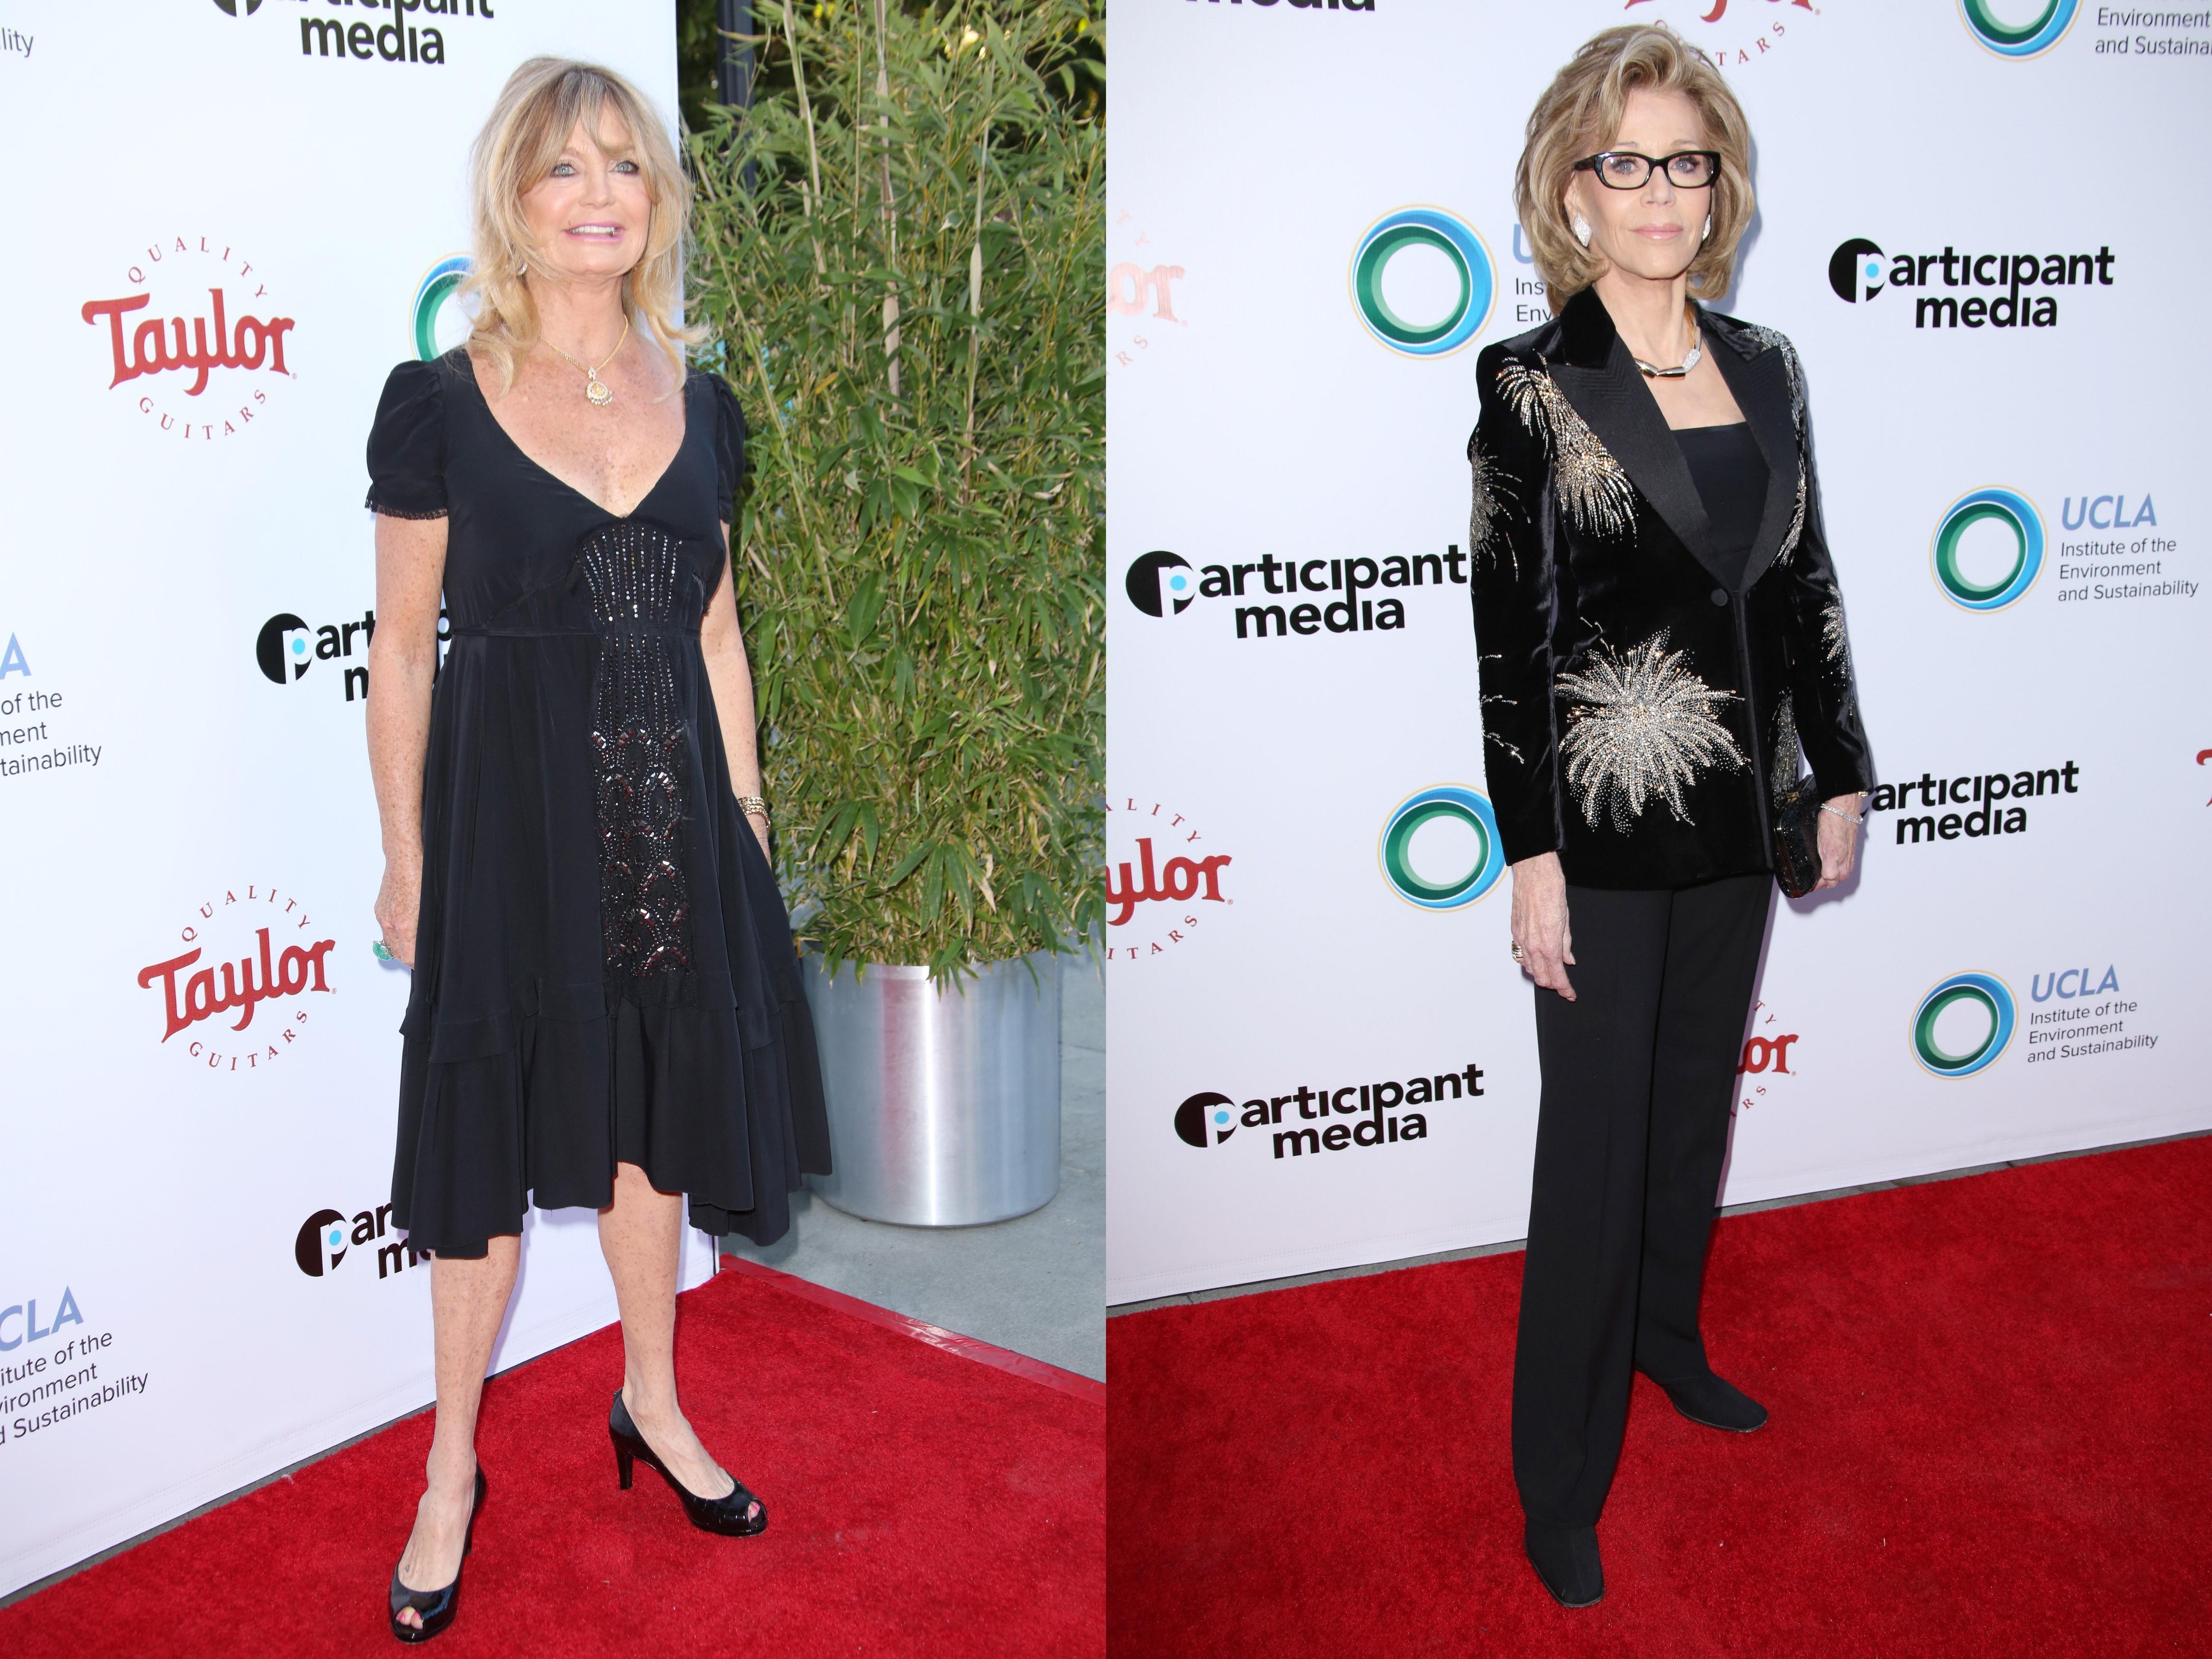 Jane Fonda, Goldie Hawn turn heads at environment gala